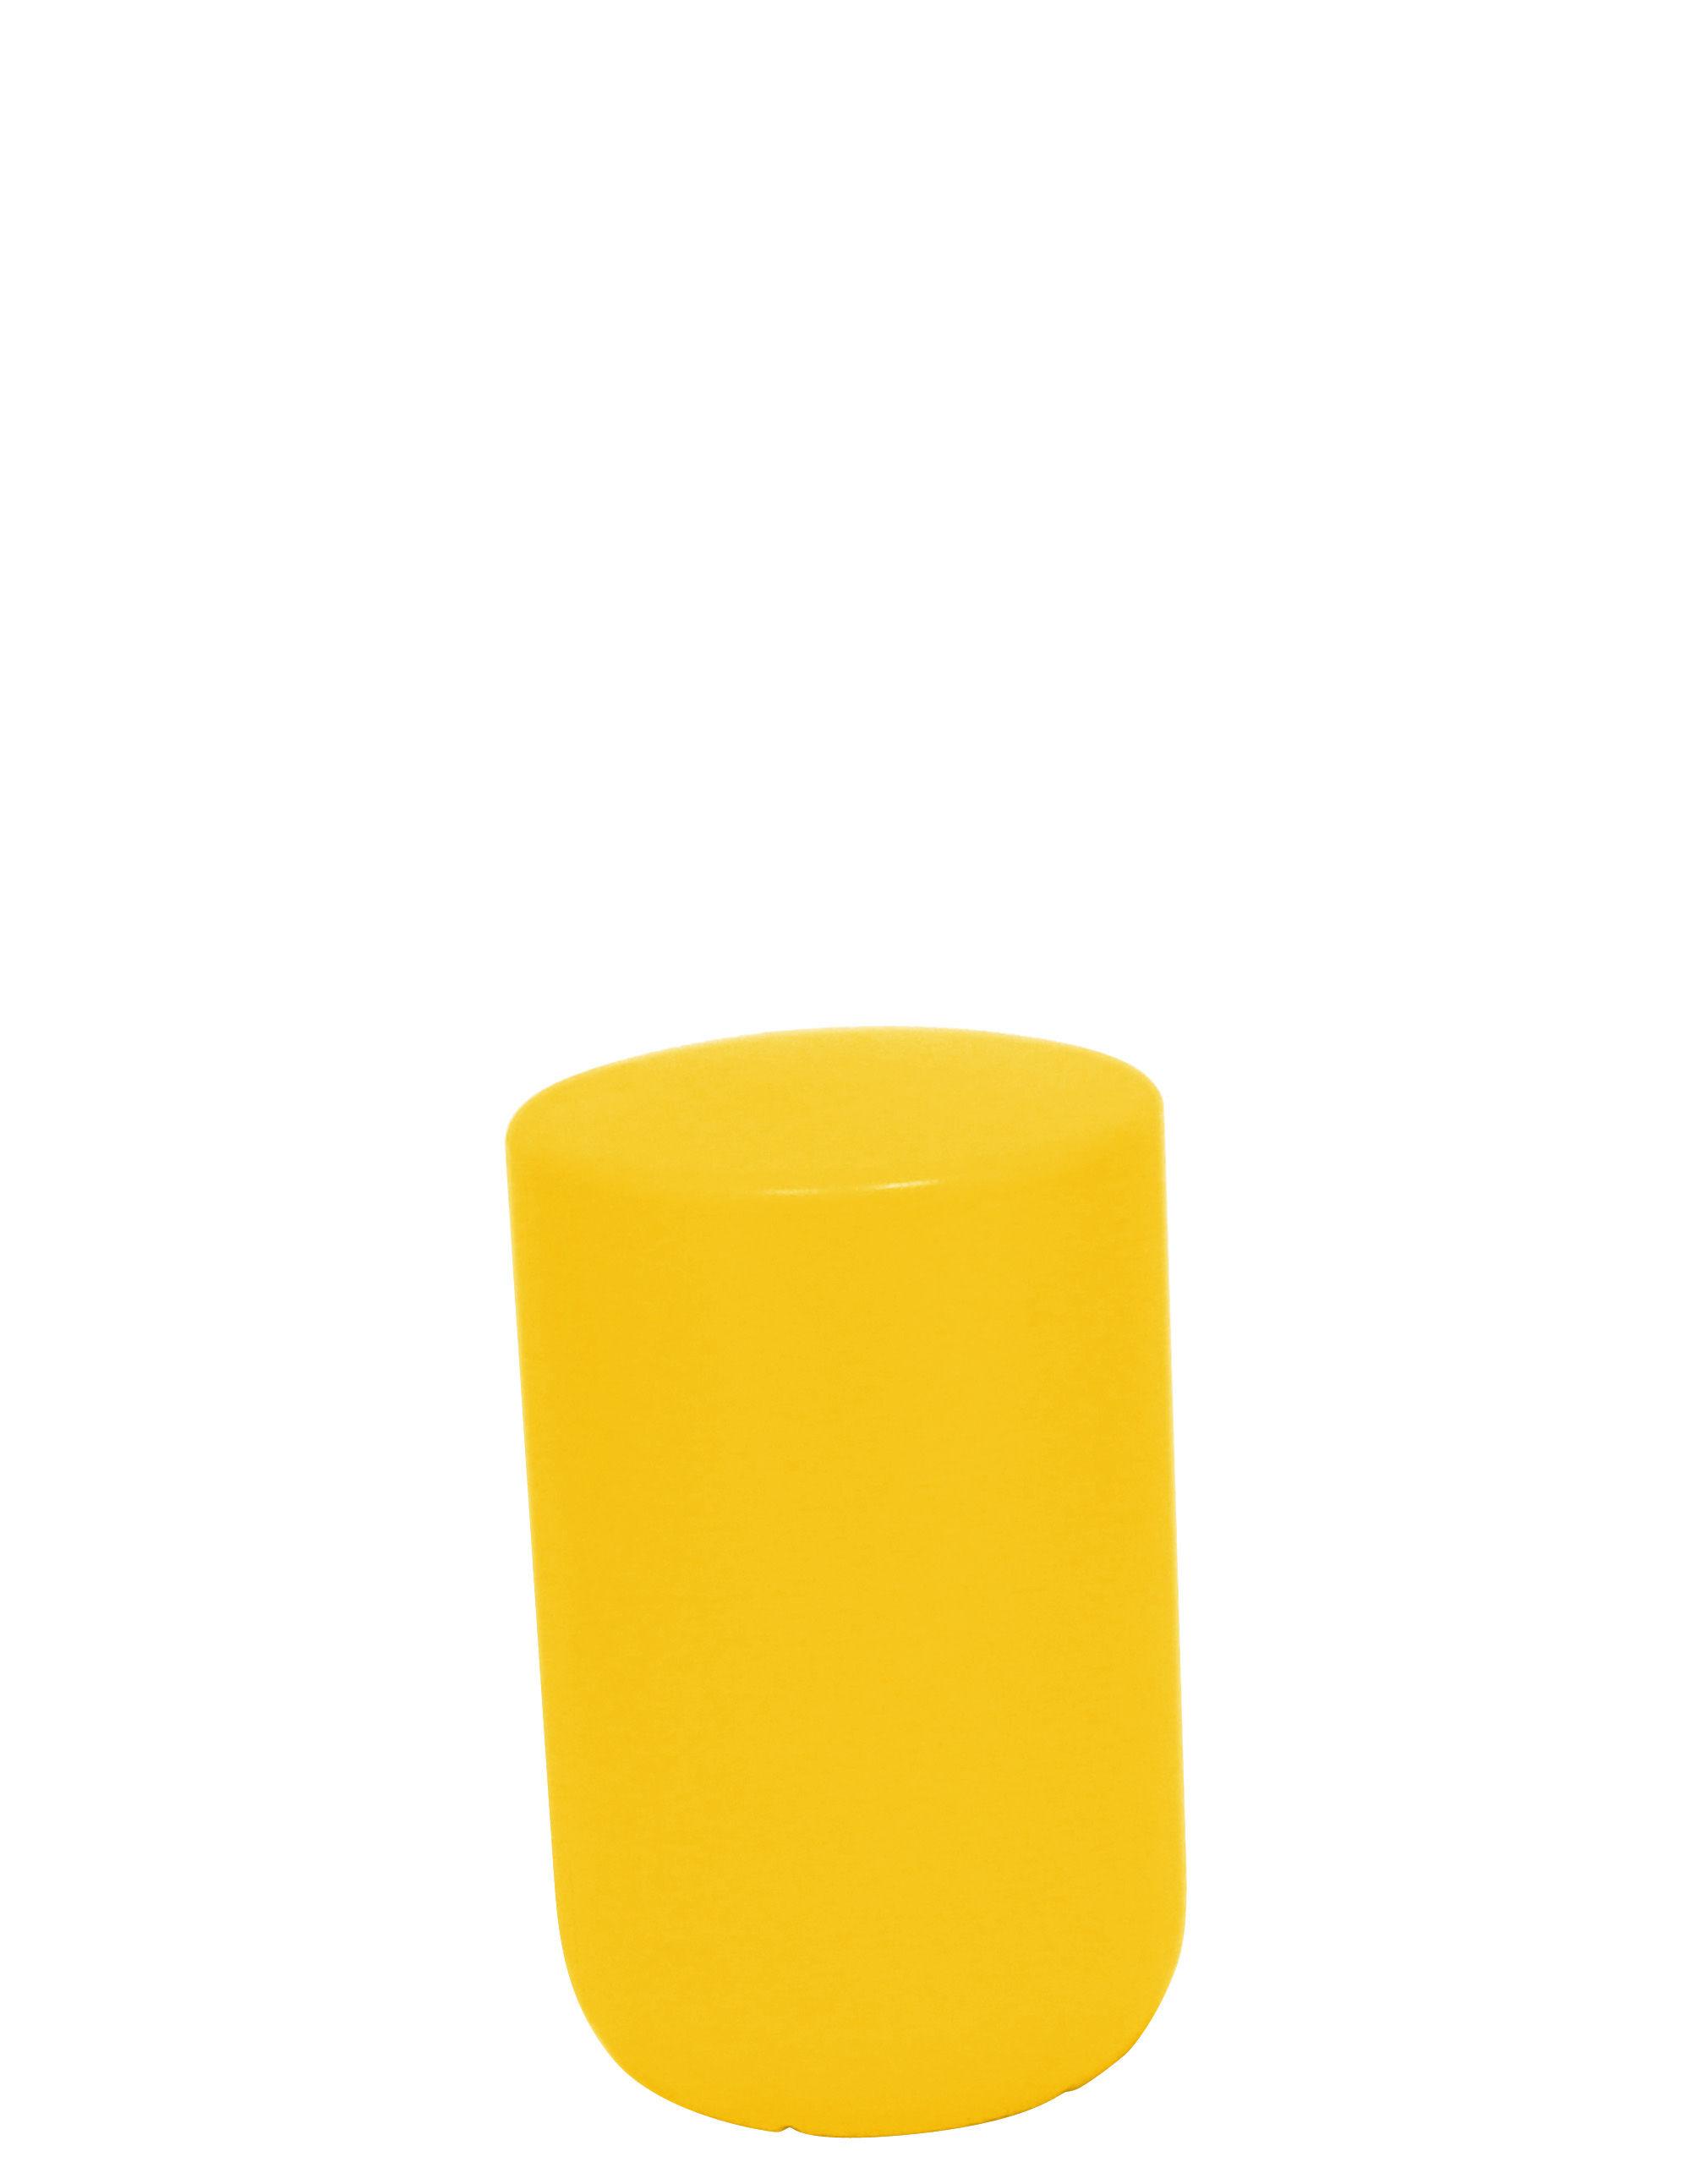 Arredamento - Mobili per bambini - Sgabello bimbi Sway - H 34 cm di Thelermont Hupton - Giallo - Polietilene